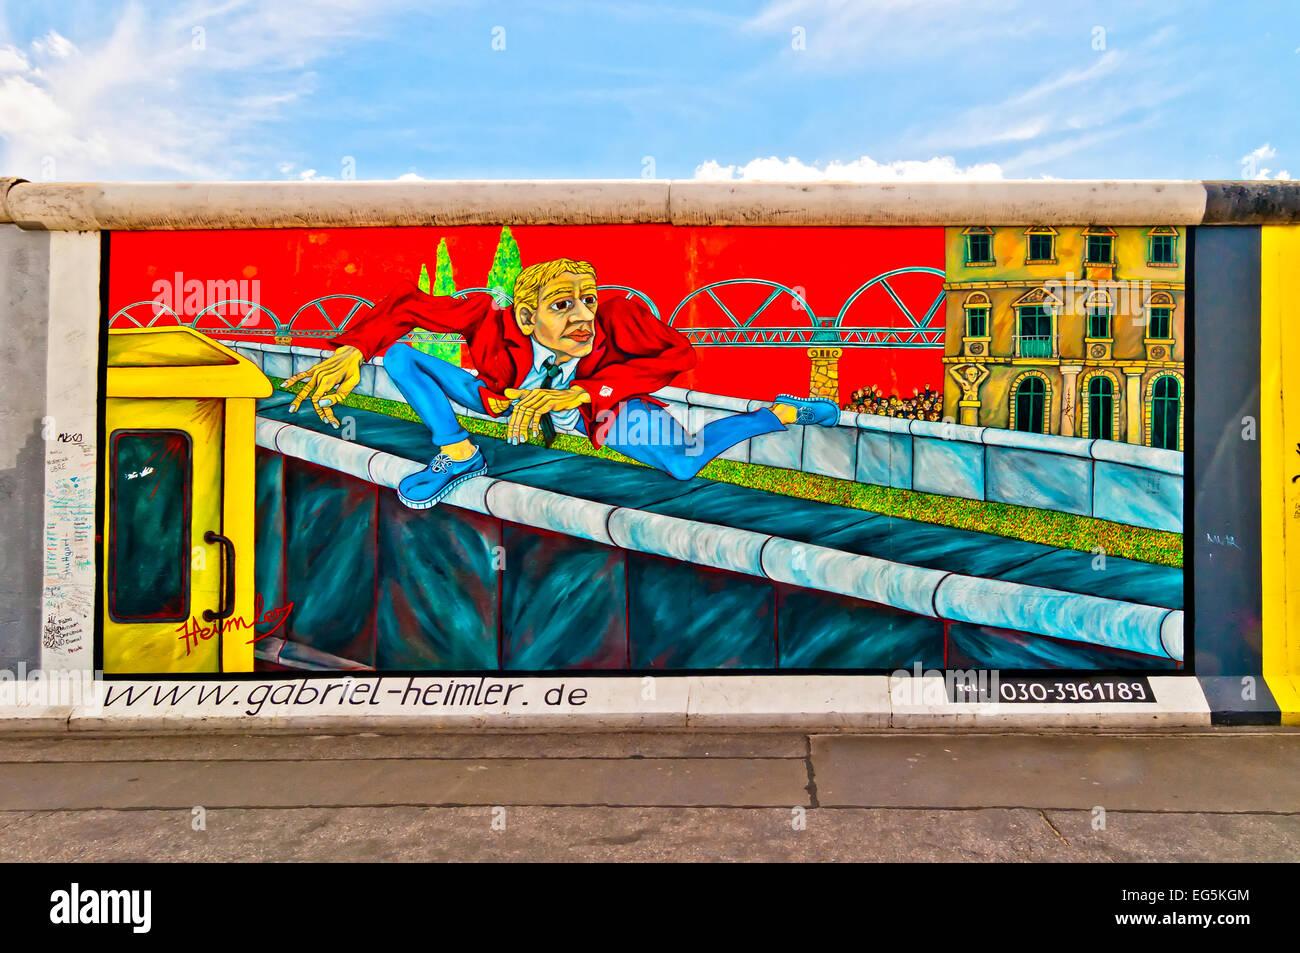 BERLIN, GERMANY - JUNE 10, 2013:  memorable segment of the Wall with work of artist Gabriel Heimler in Berlin, Germany. - Stock Image